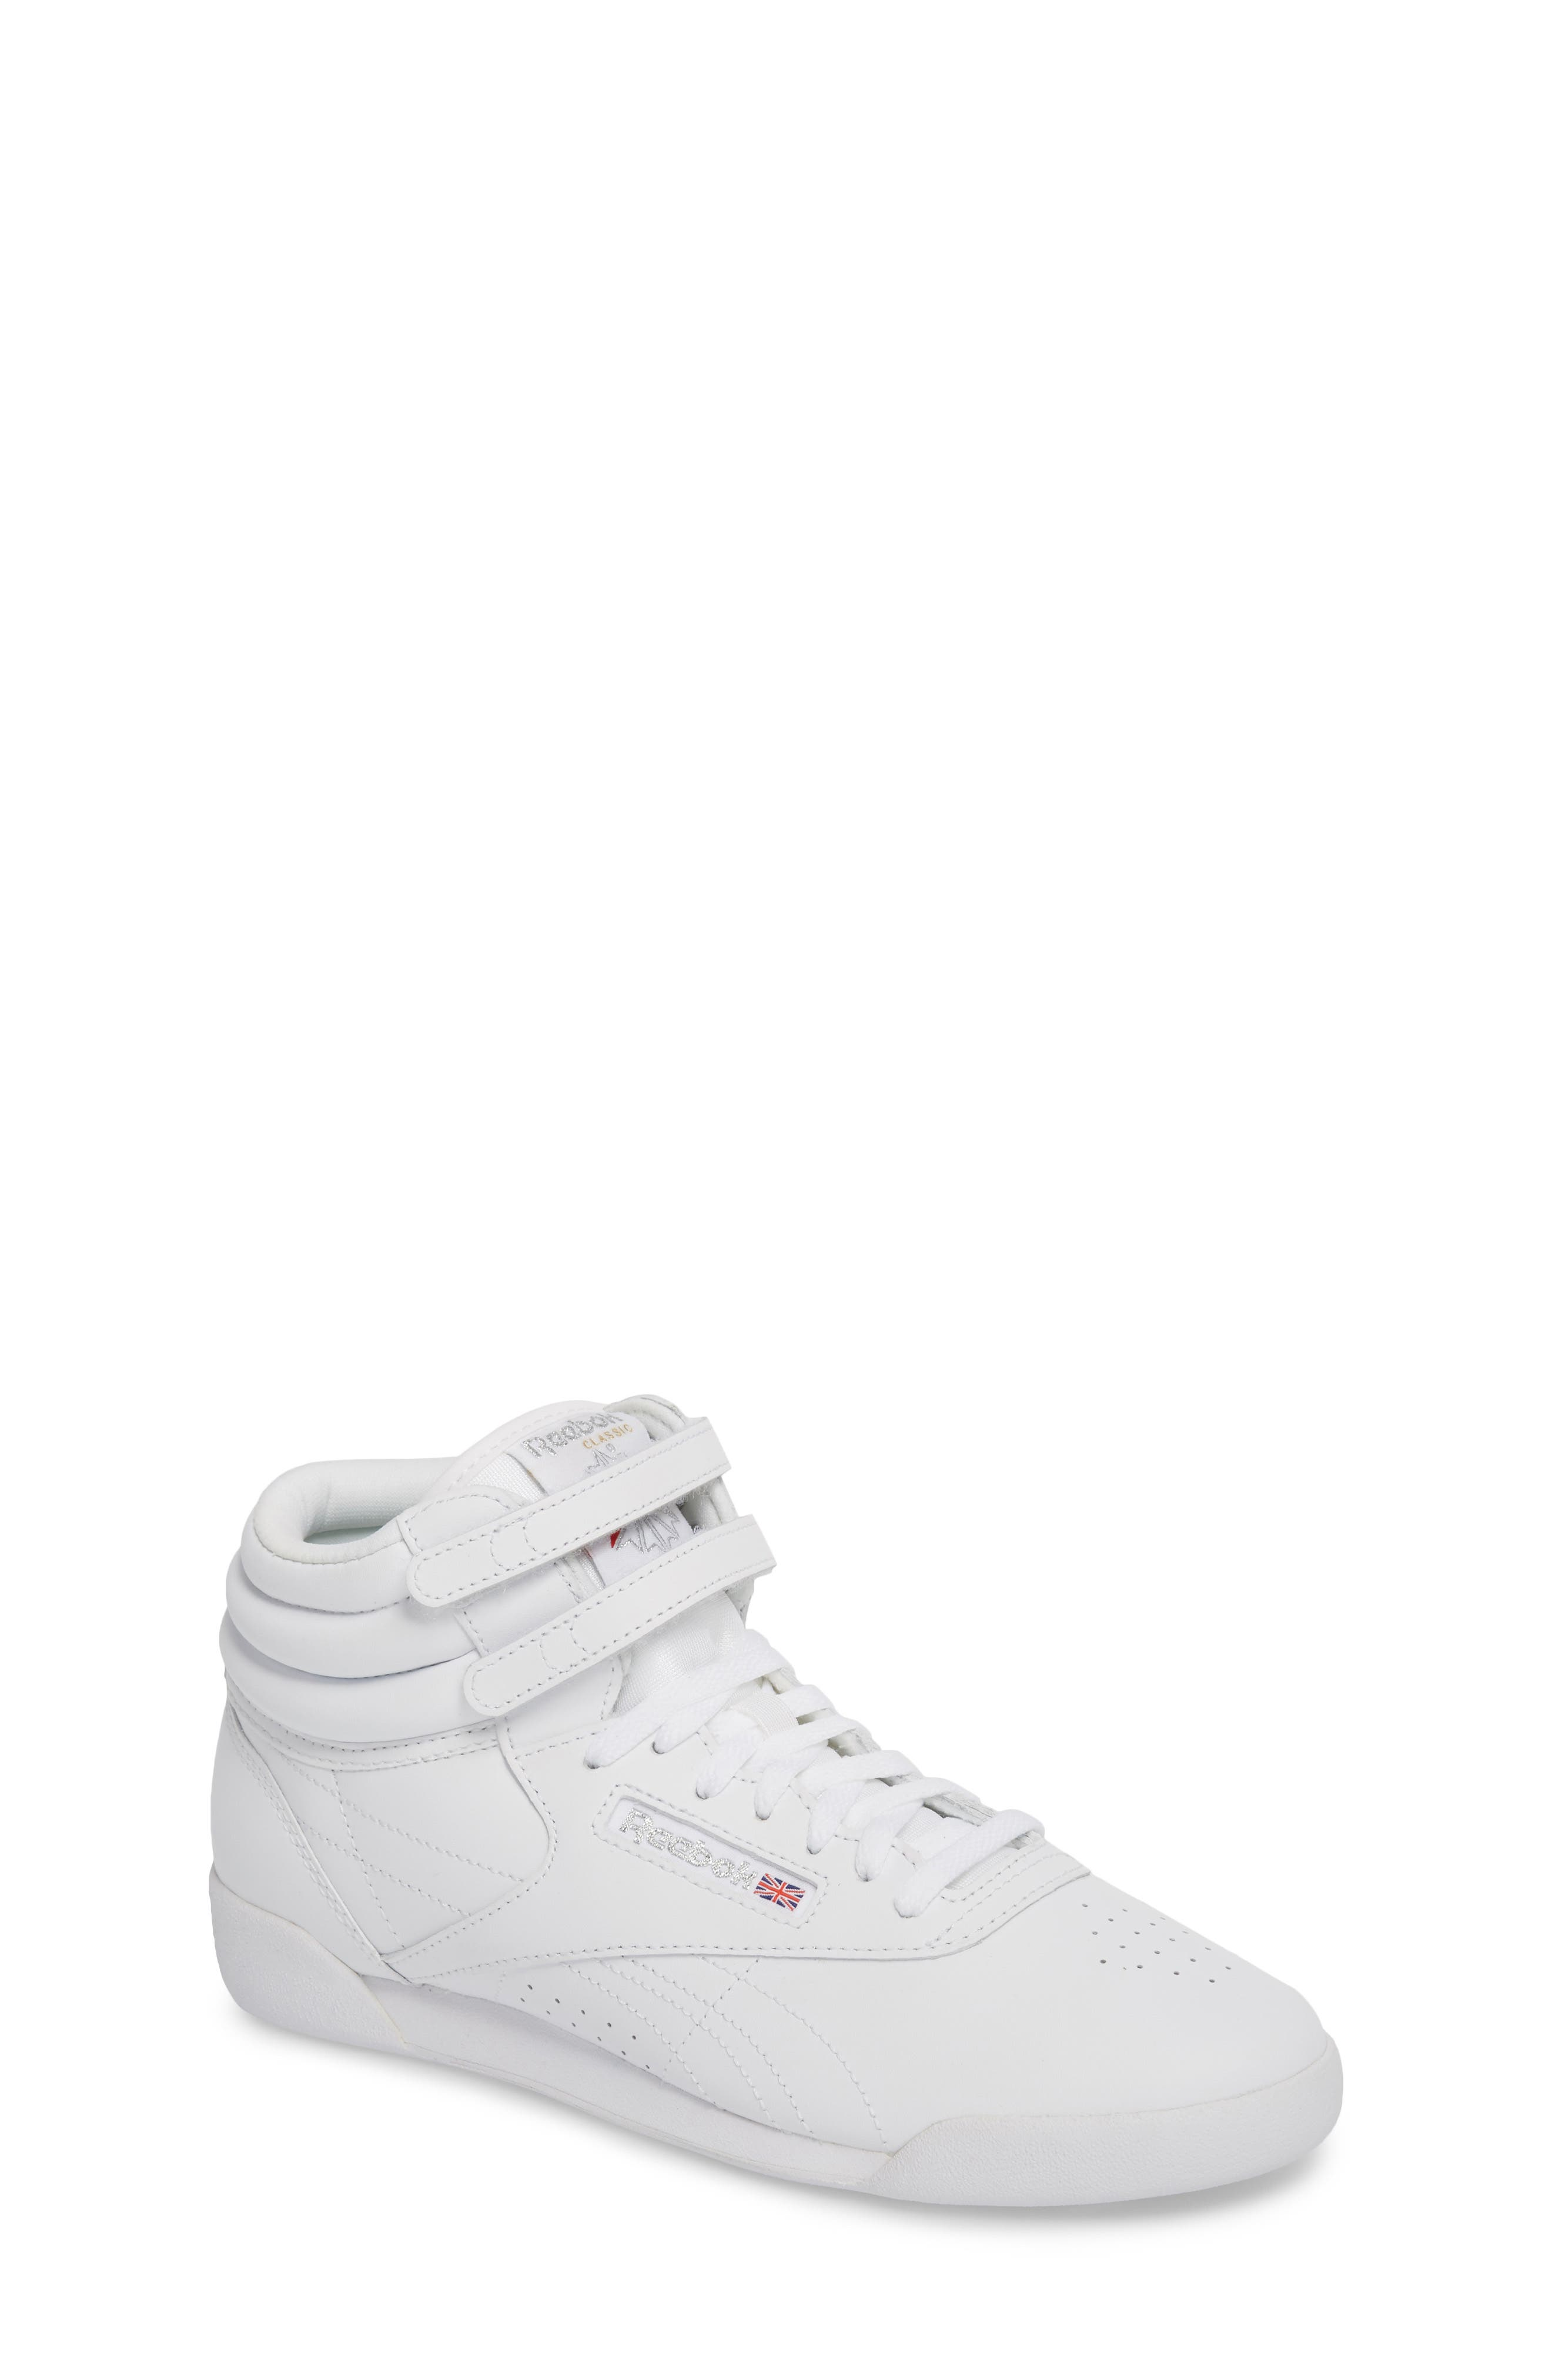 Freestyle Hi Sneaker,                             Main thumbnail 1, color,                             WHITE/ SILVER